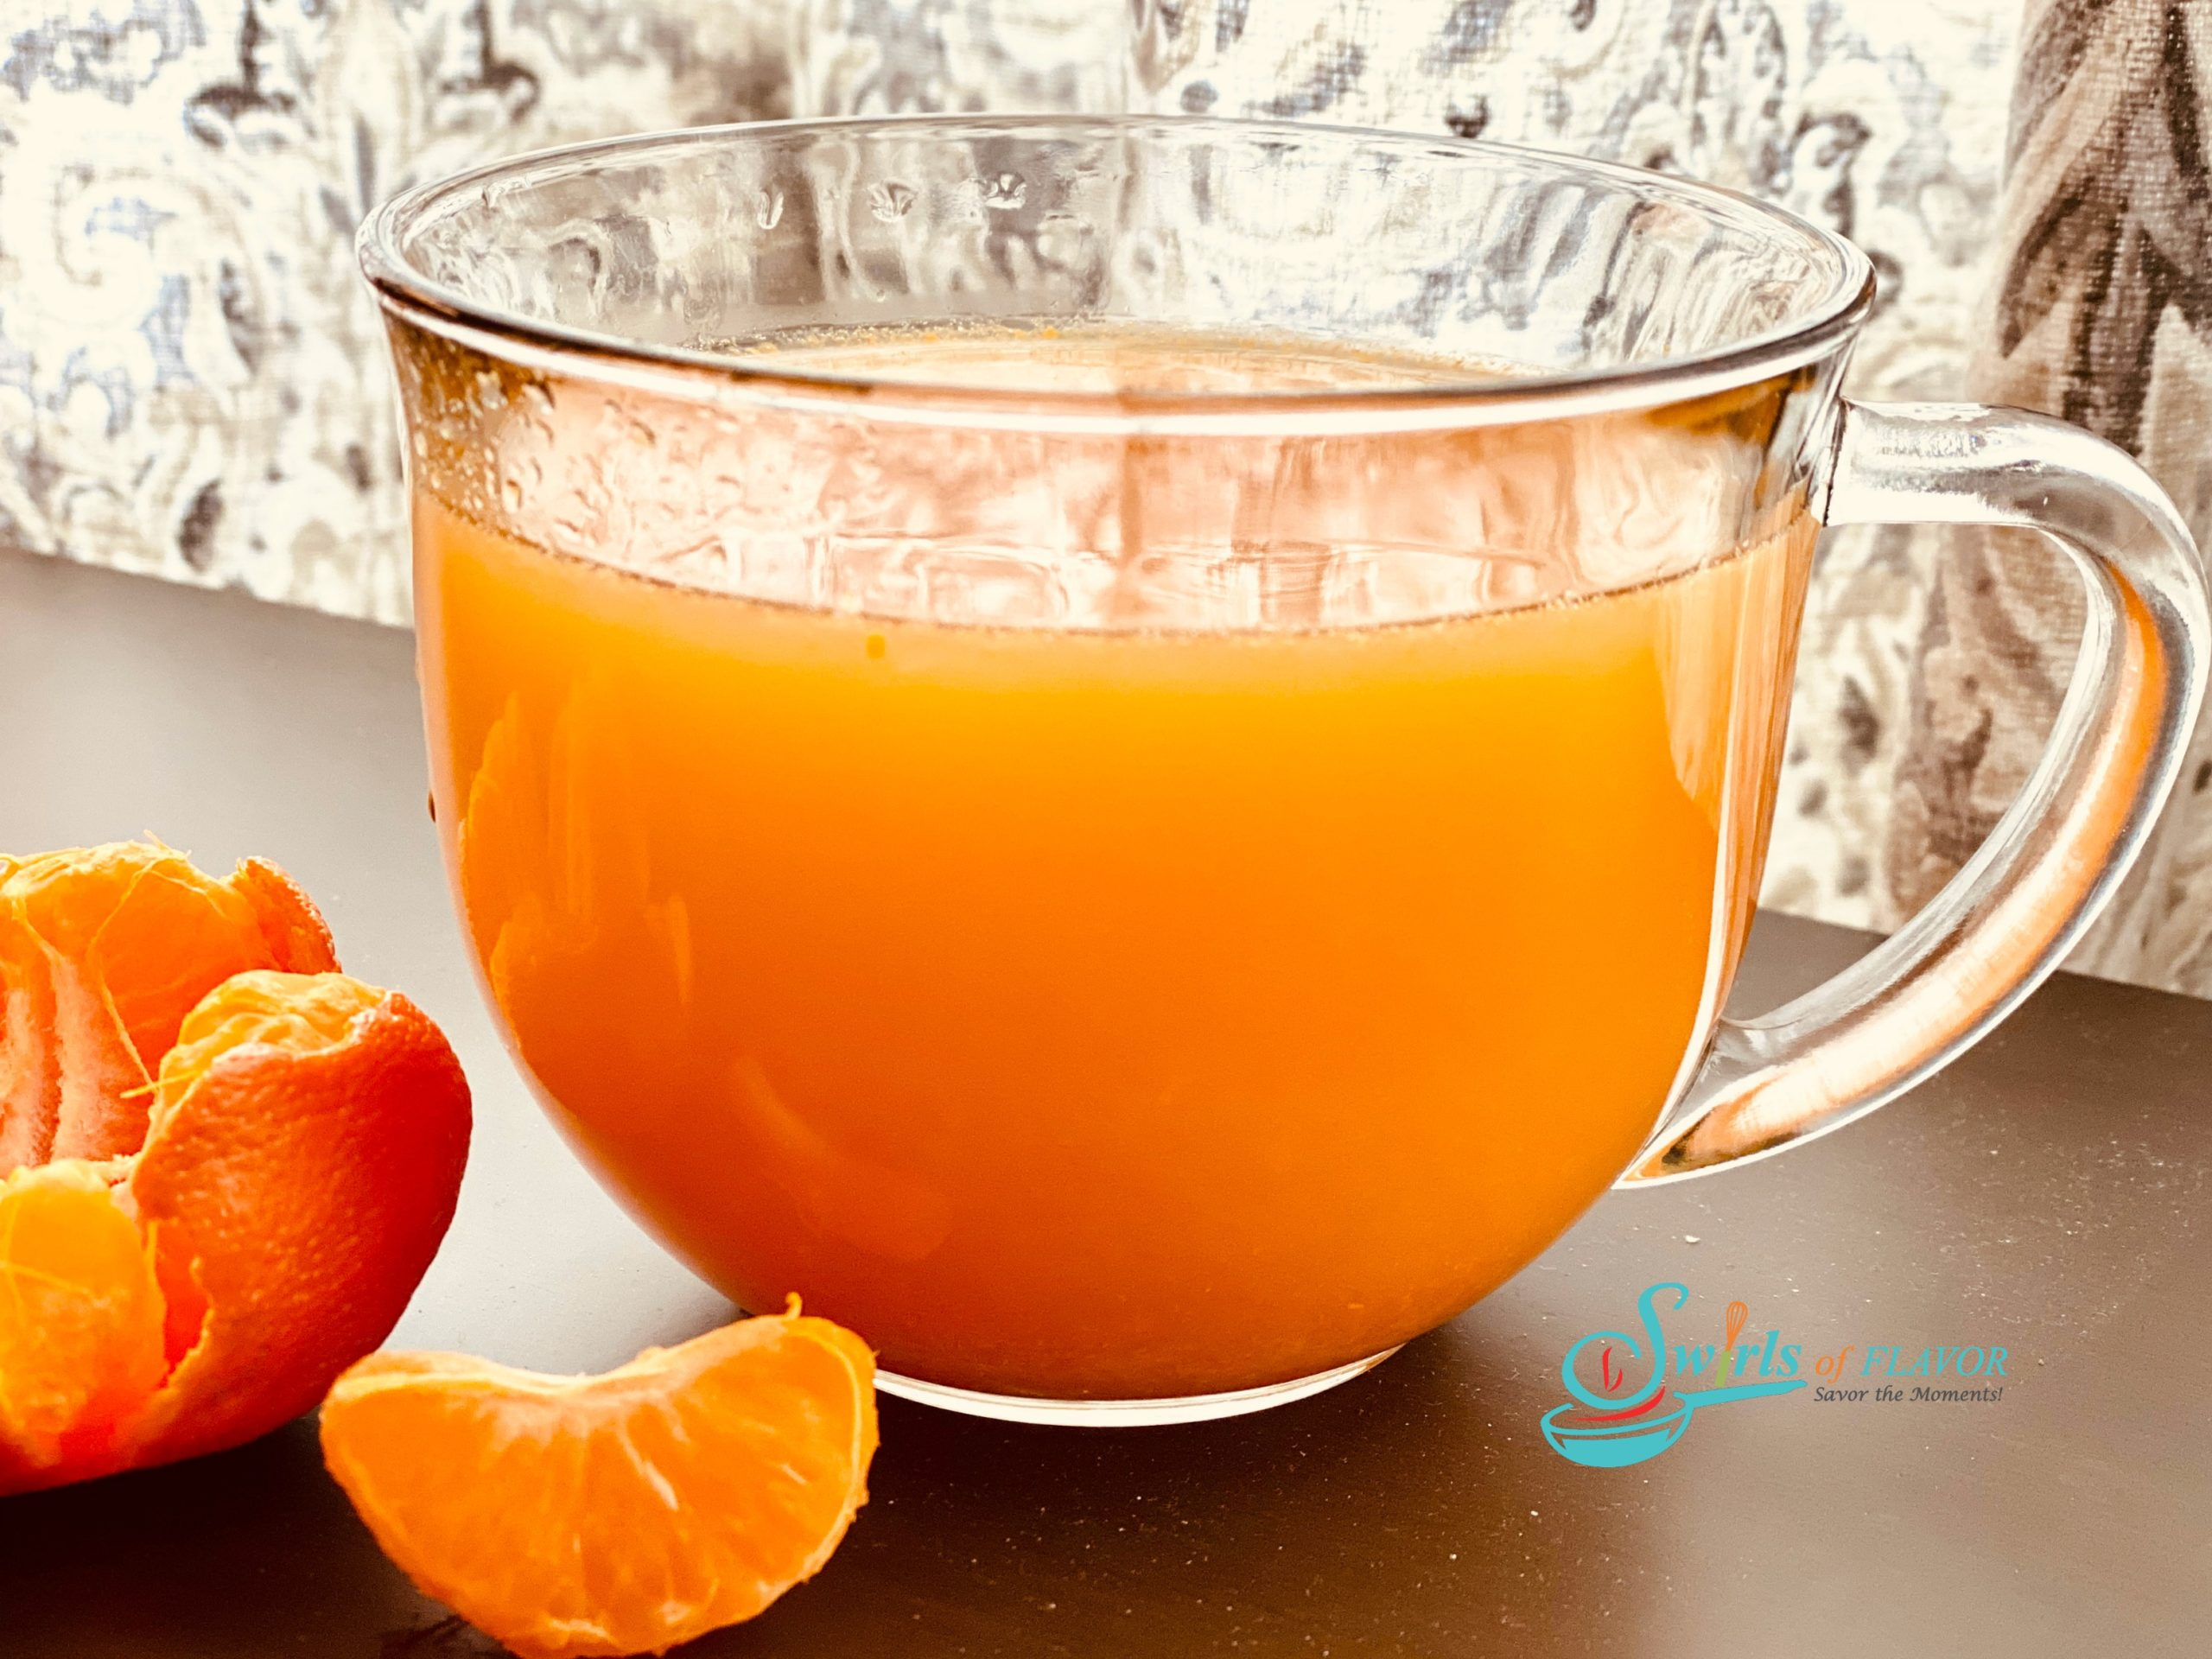 Mug of Honey Orange Vitamin C Drink